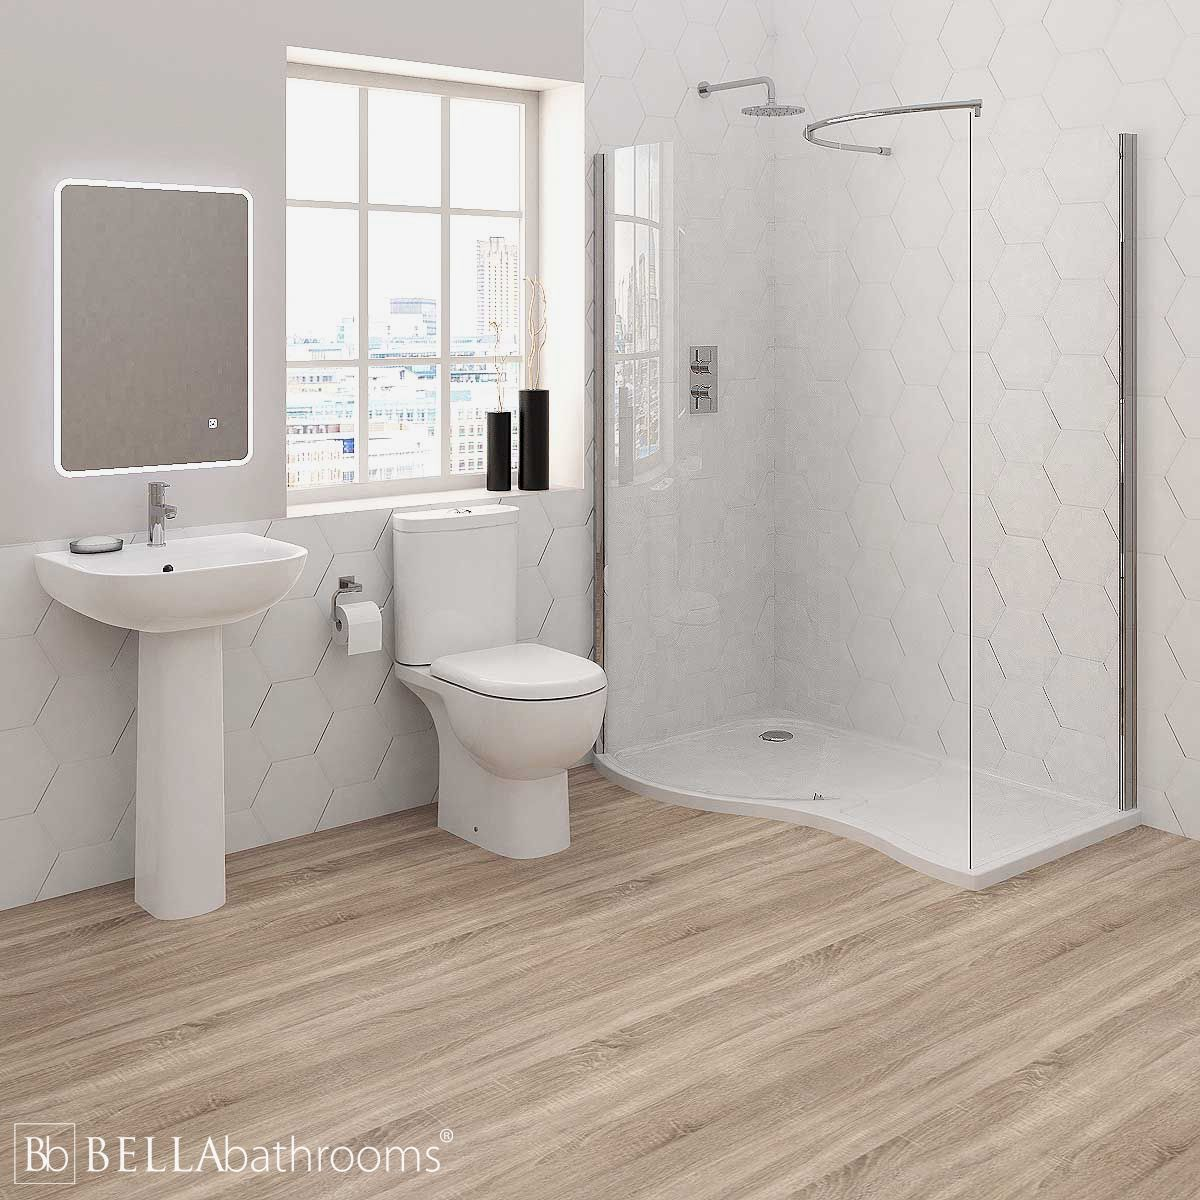 RAK Tonique Bathroom Suite with Pacific Walk-In Shower Enclosure